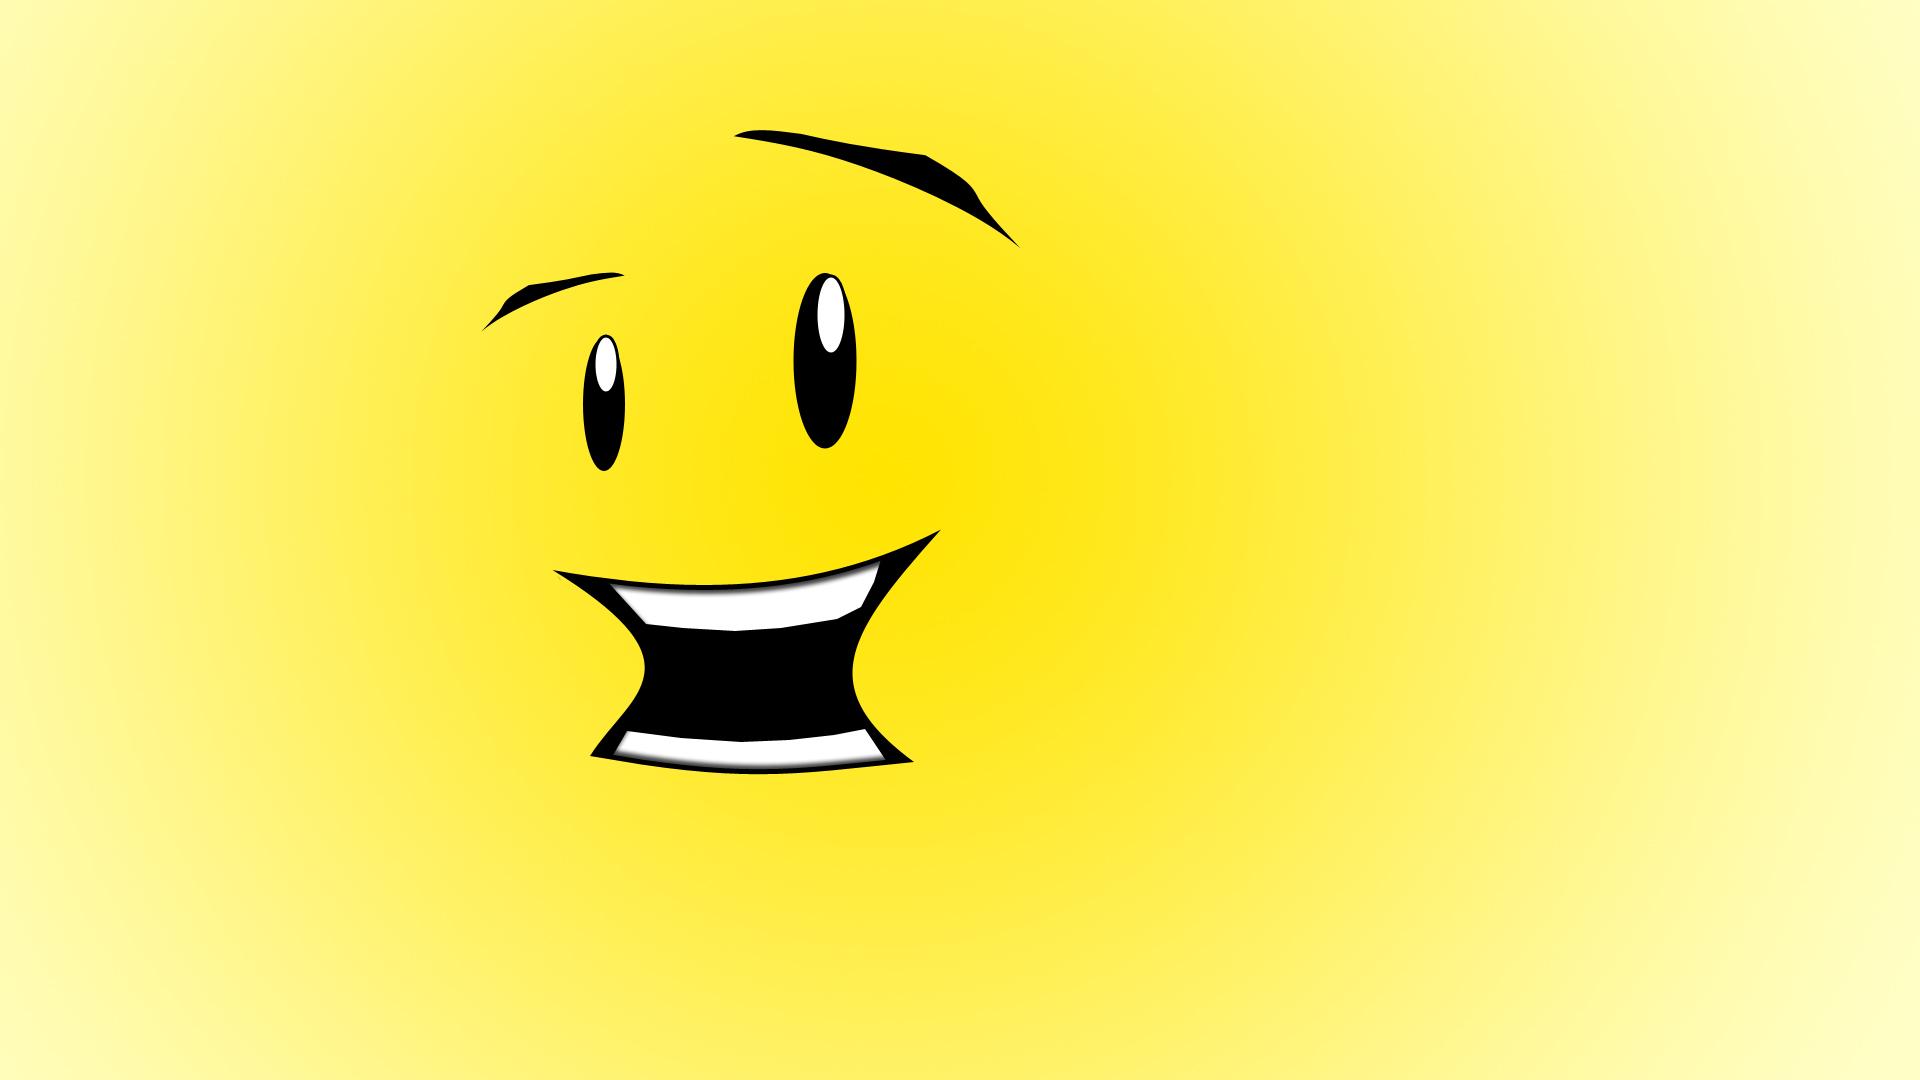 Super Happy Smiley Face 1920x1080